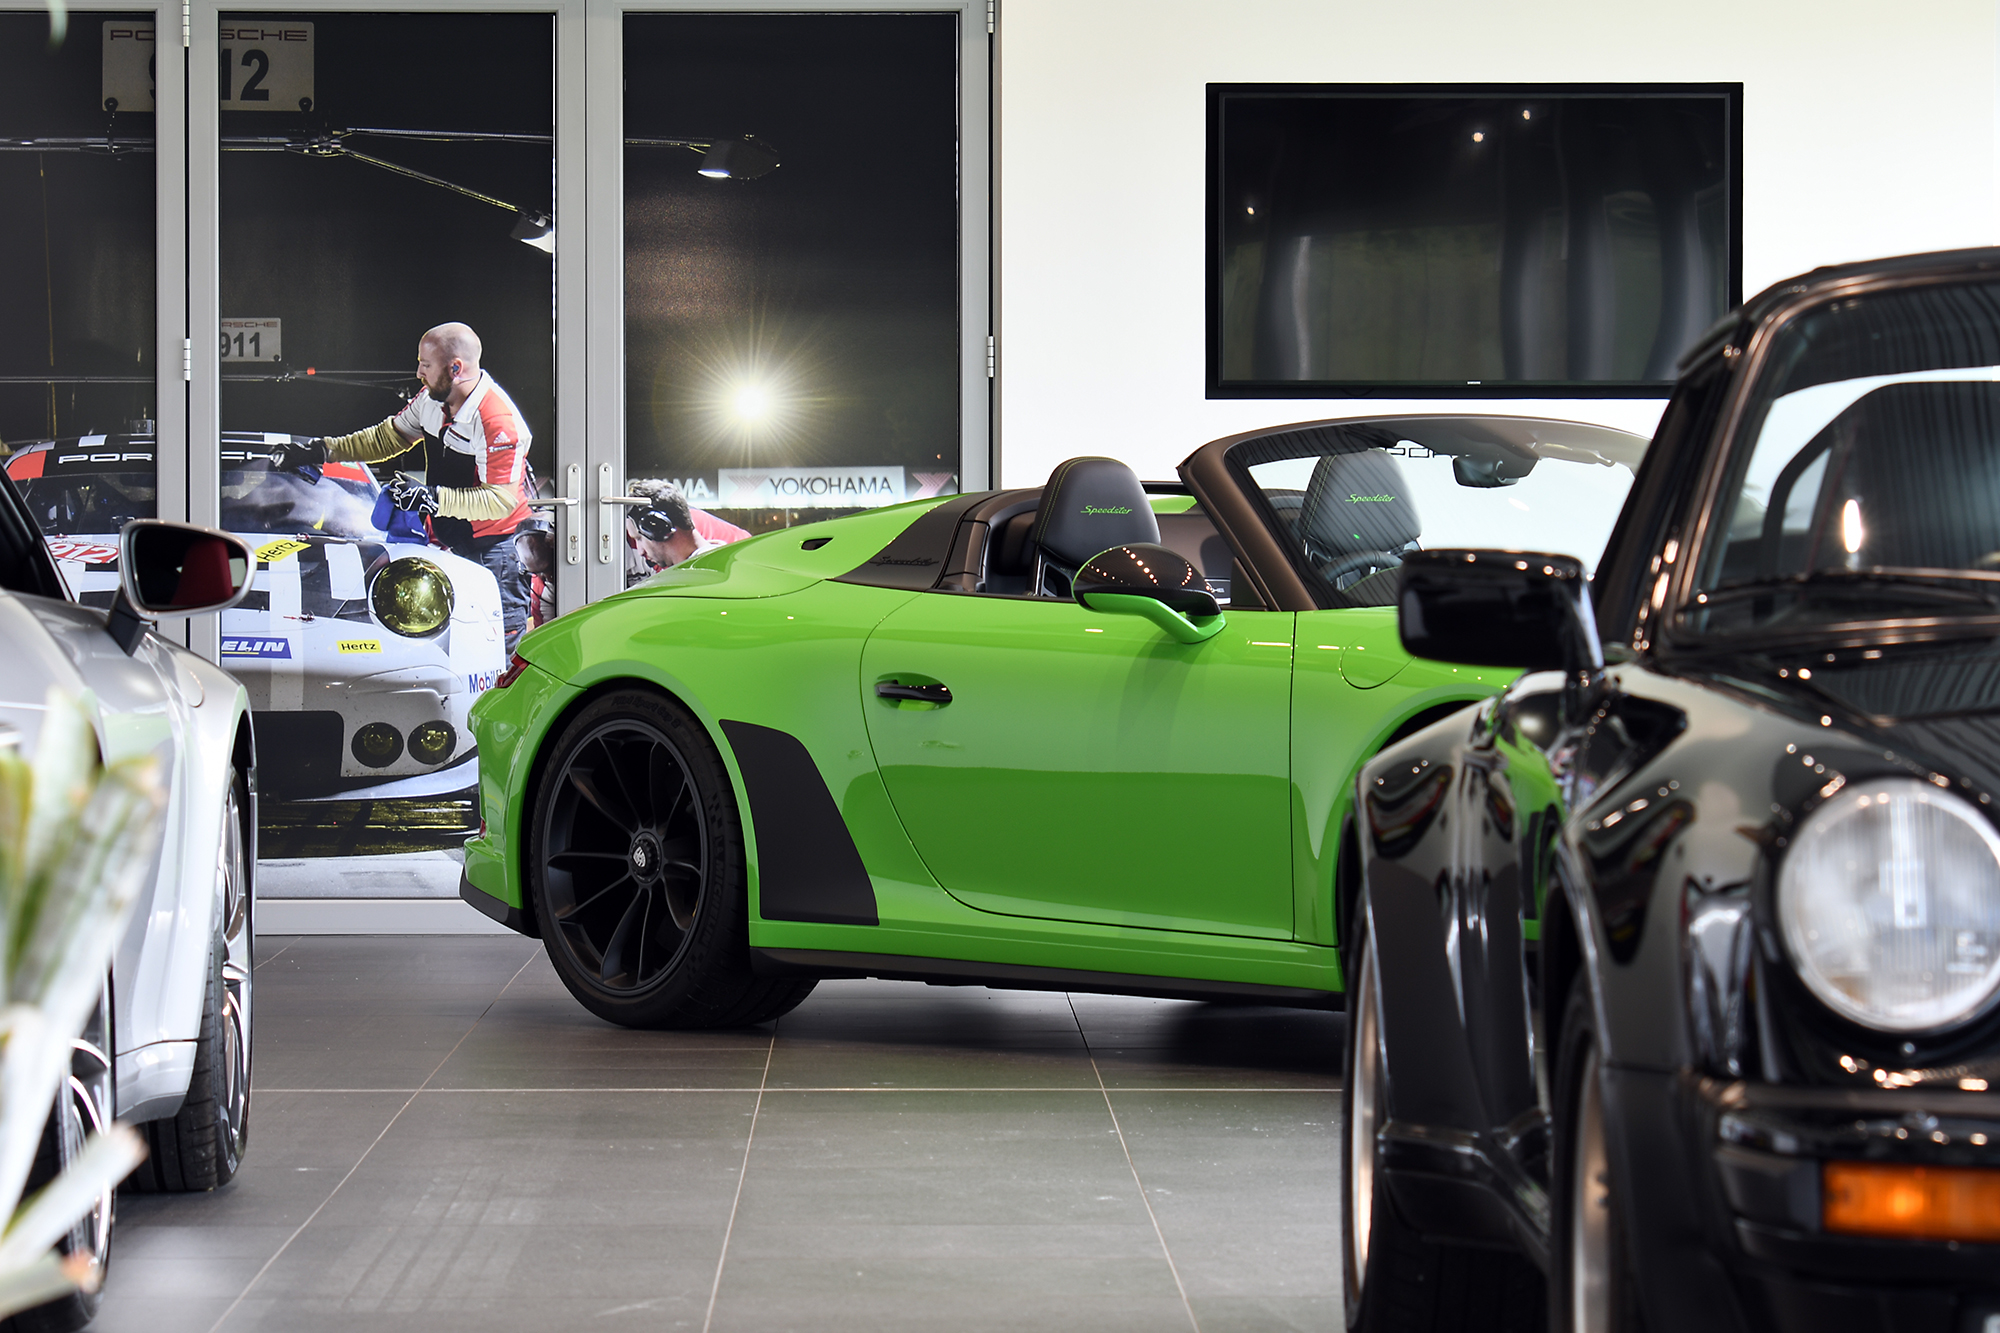 Traditional photographic image - Porsche 8